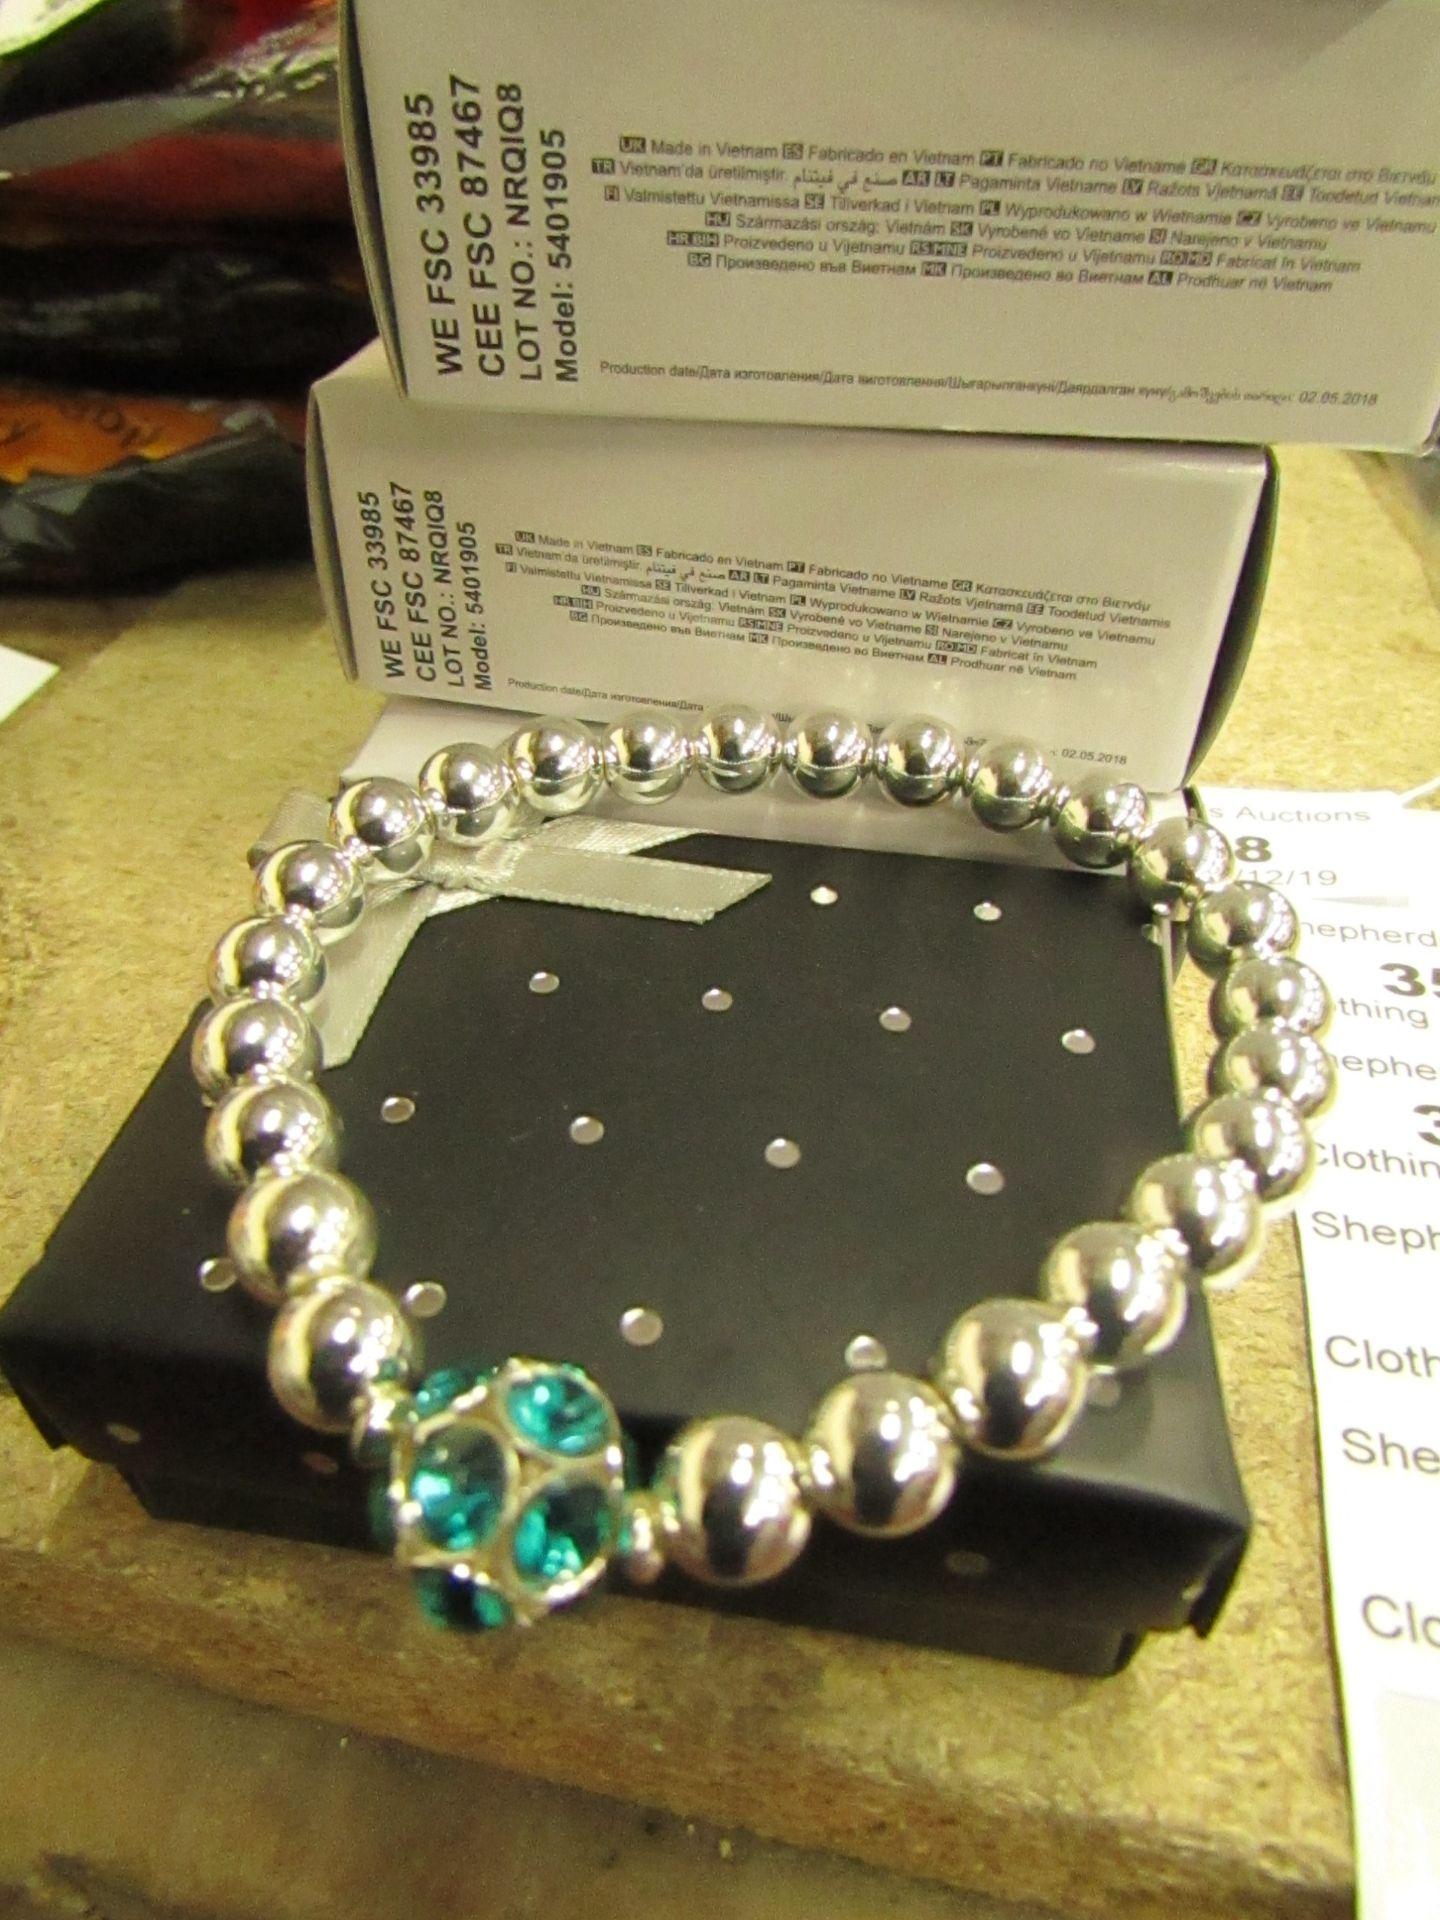 Lot 362 - 3 x Avon Brooke Stretch Sliver coloured Bead & Blue Zircon Bracelets in Gift Box new